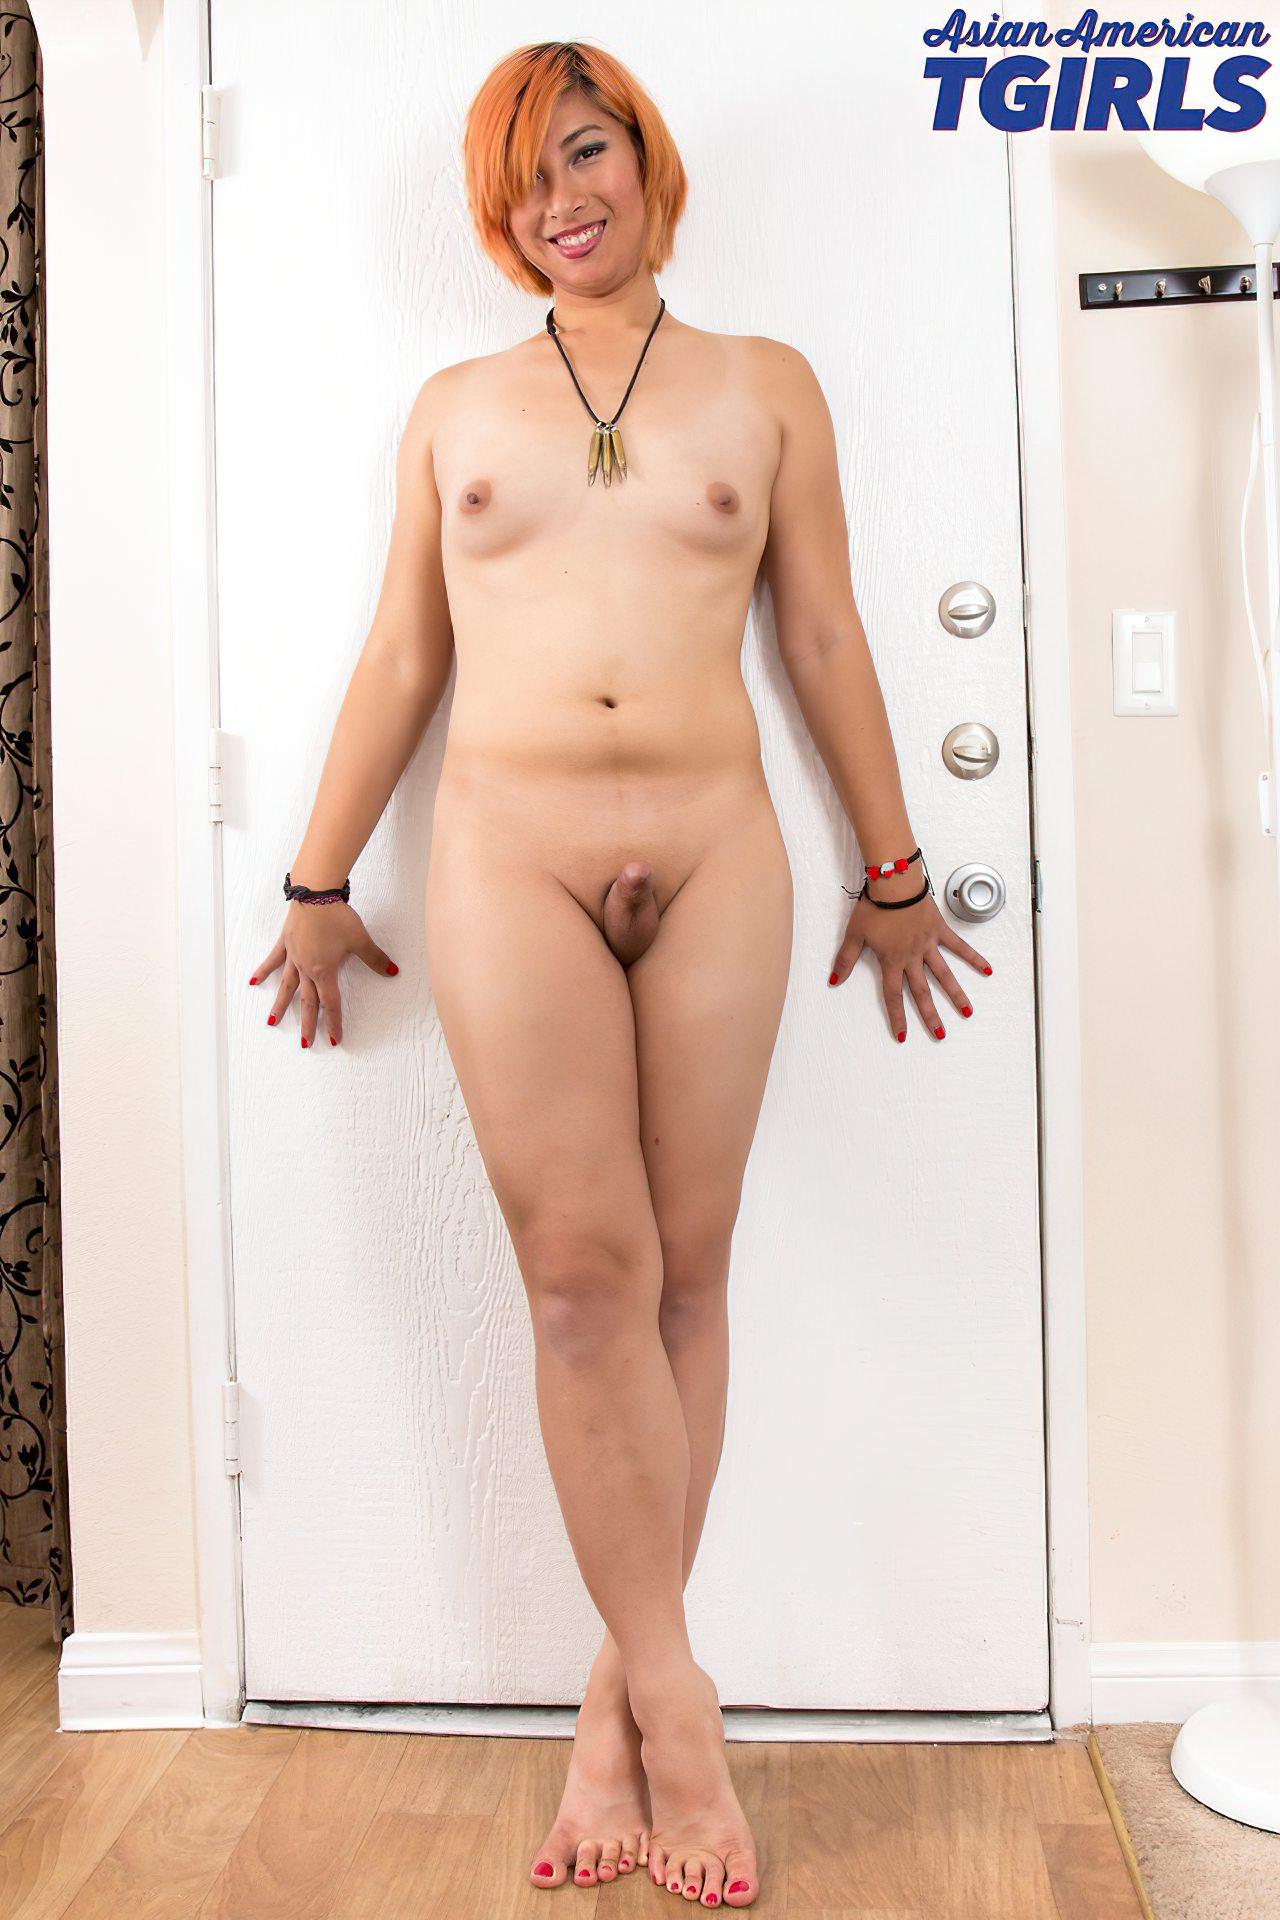 Fotos de Travestis (45)